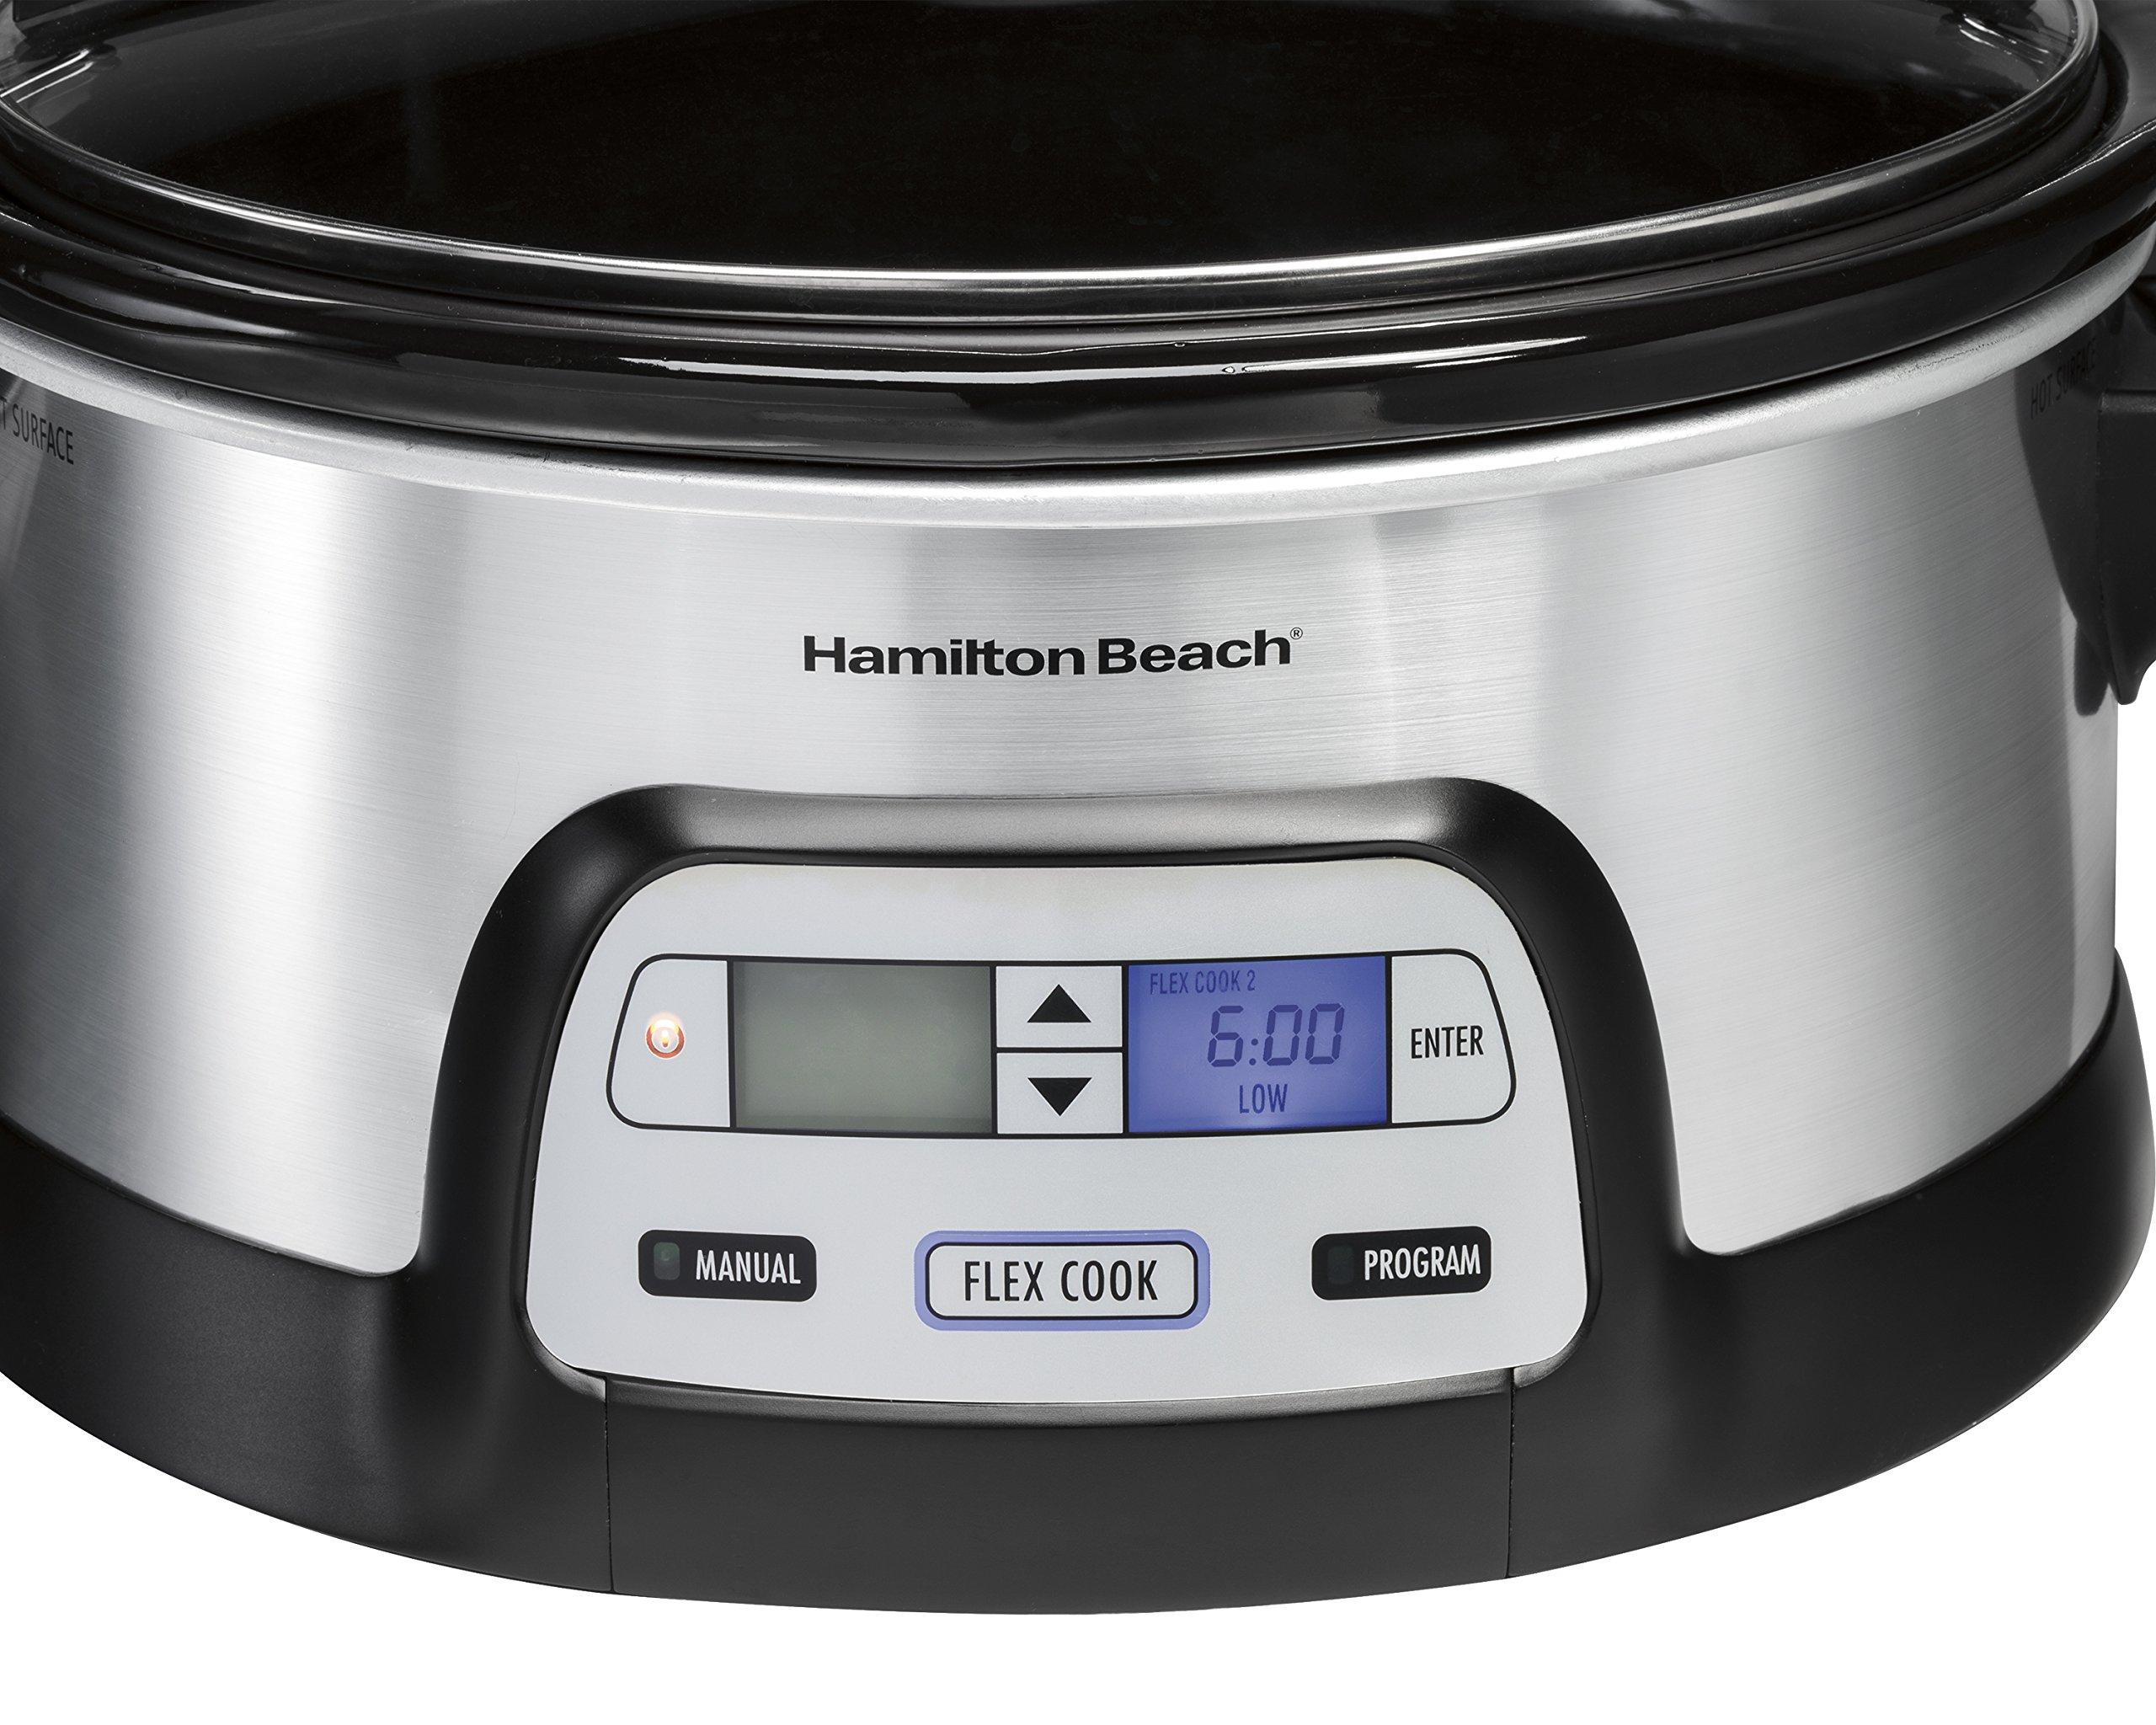 Hamilton Beach 33861 Programmable Slow Cooker, 6 Quart, Dual Digital Timer, Stainless Steel by Hamilton Beach (Image #2)